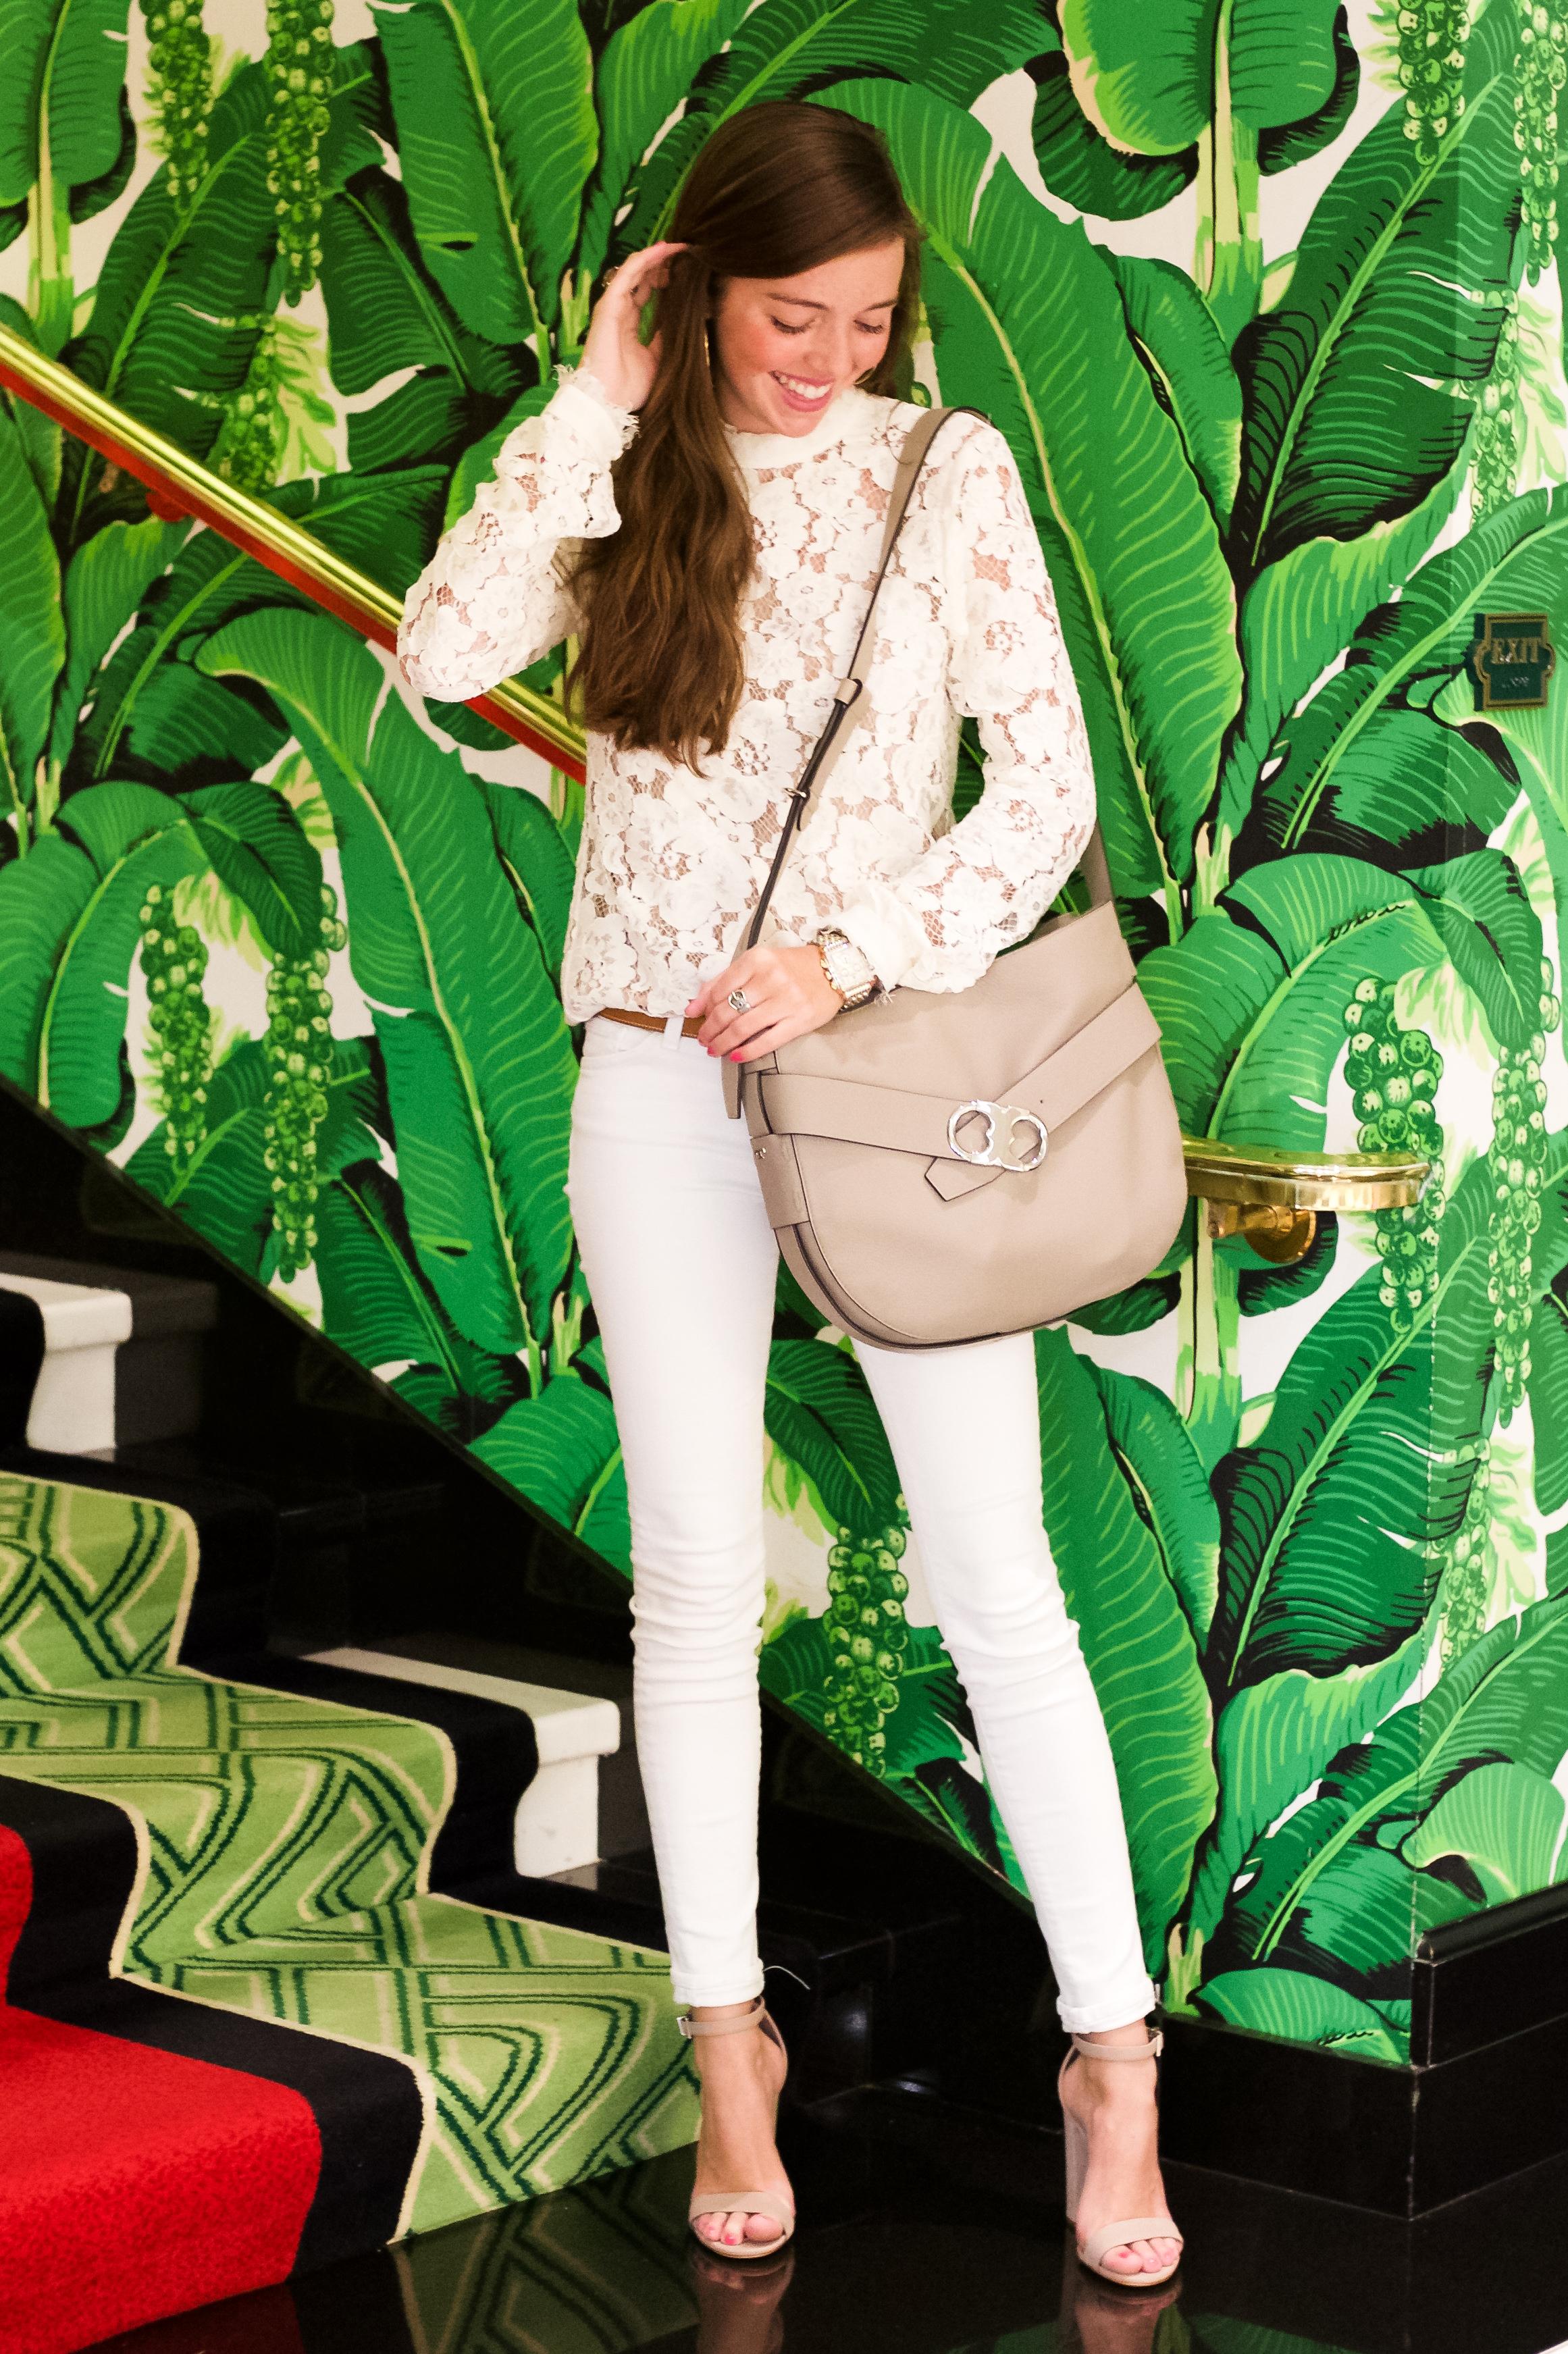 fashion blogger lcb style greenbrier tory burch j. crew (4 of 14).jpg